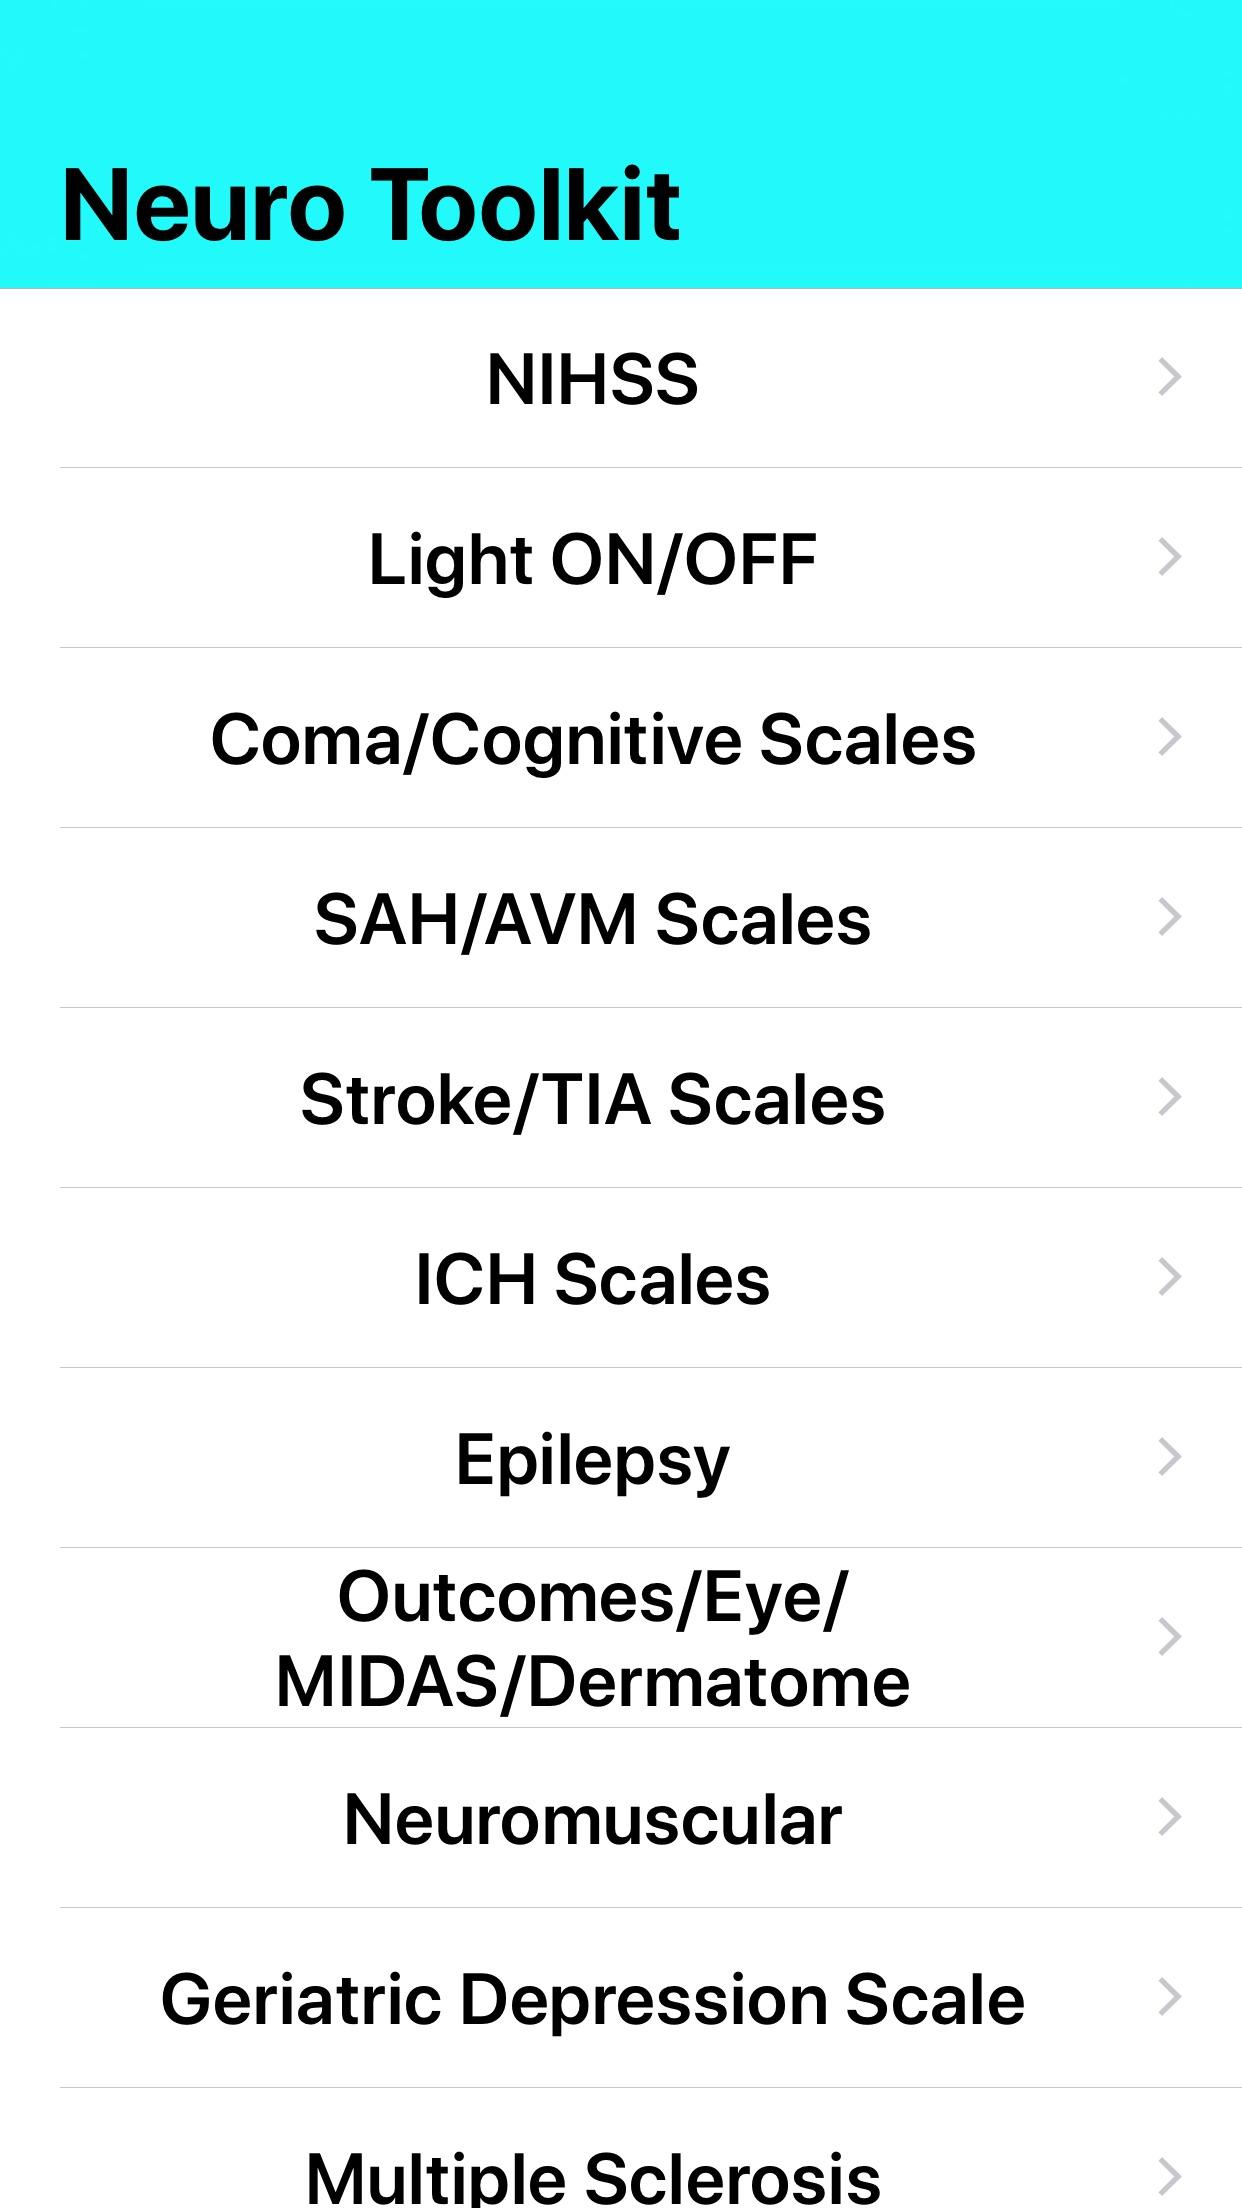 Neuro Toolkit Screenshot